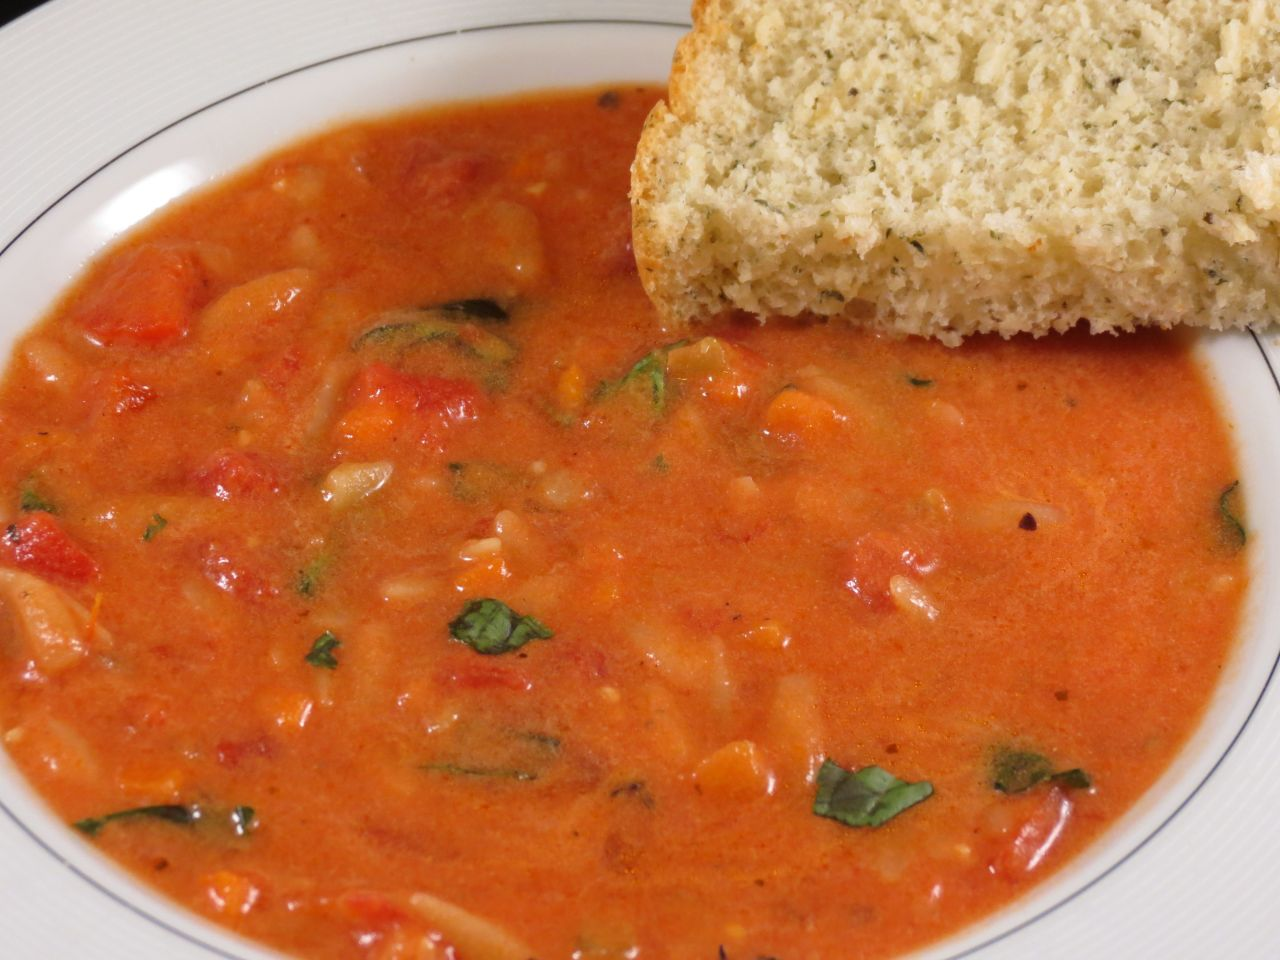 Tomato Basil Orzo Soup final picture